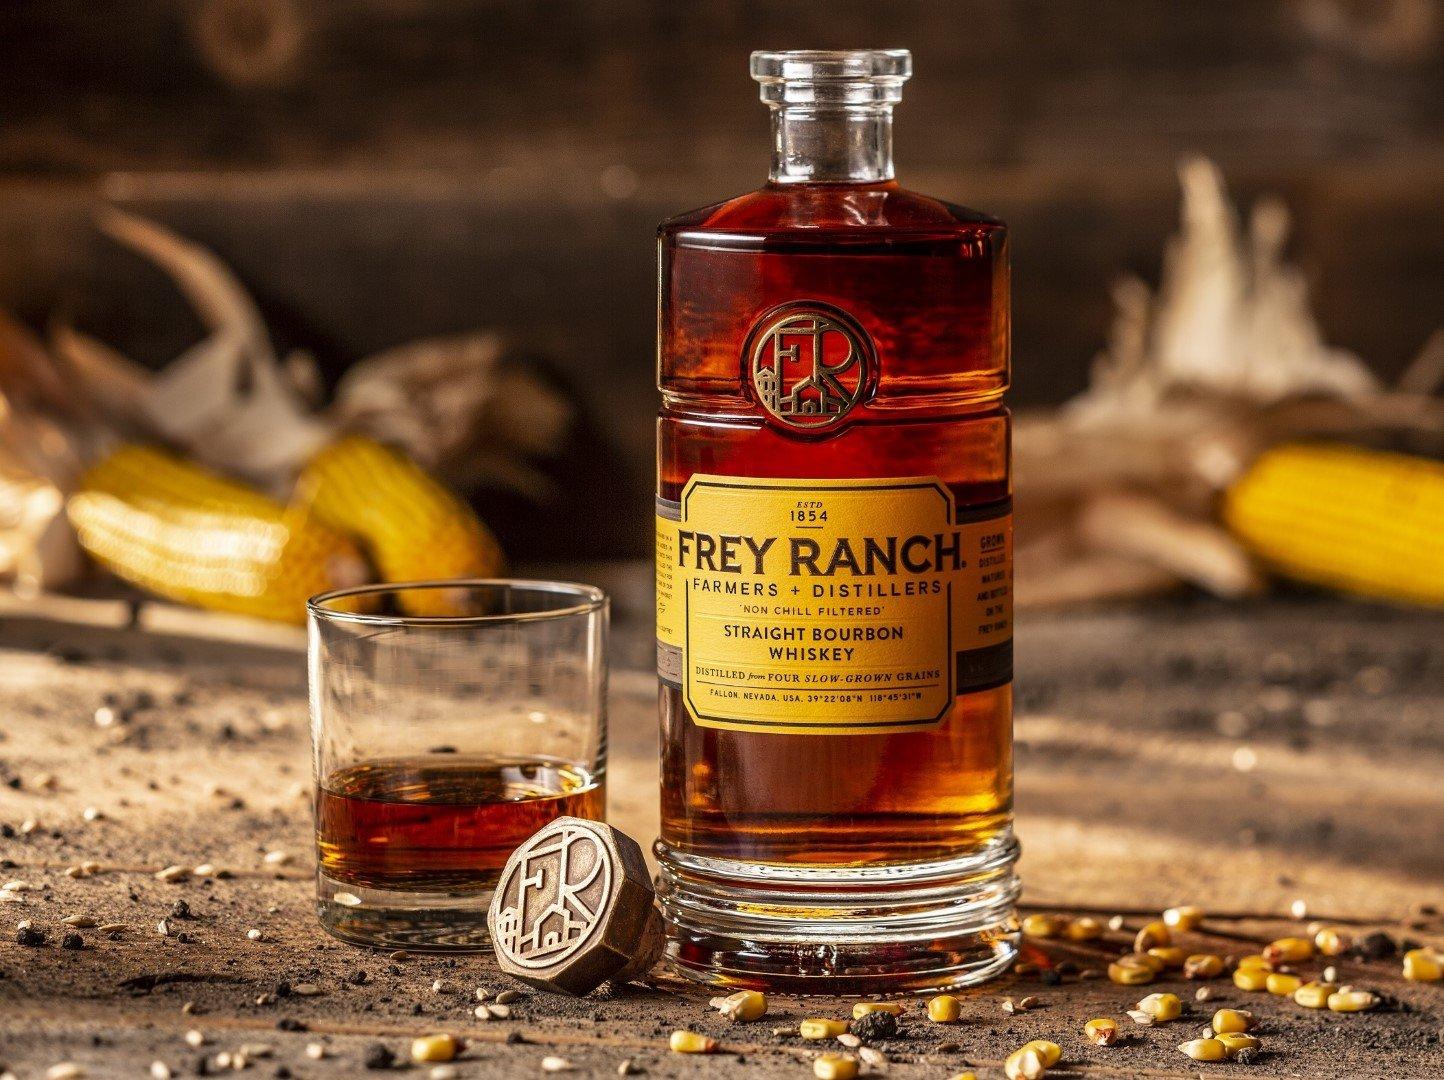 Frey Ranch Bourbon